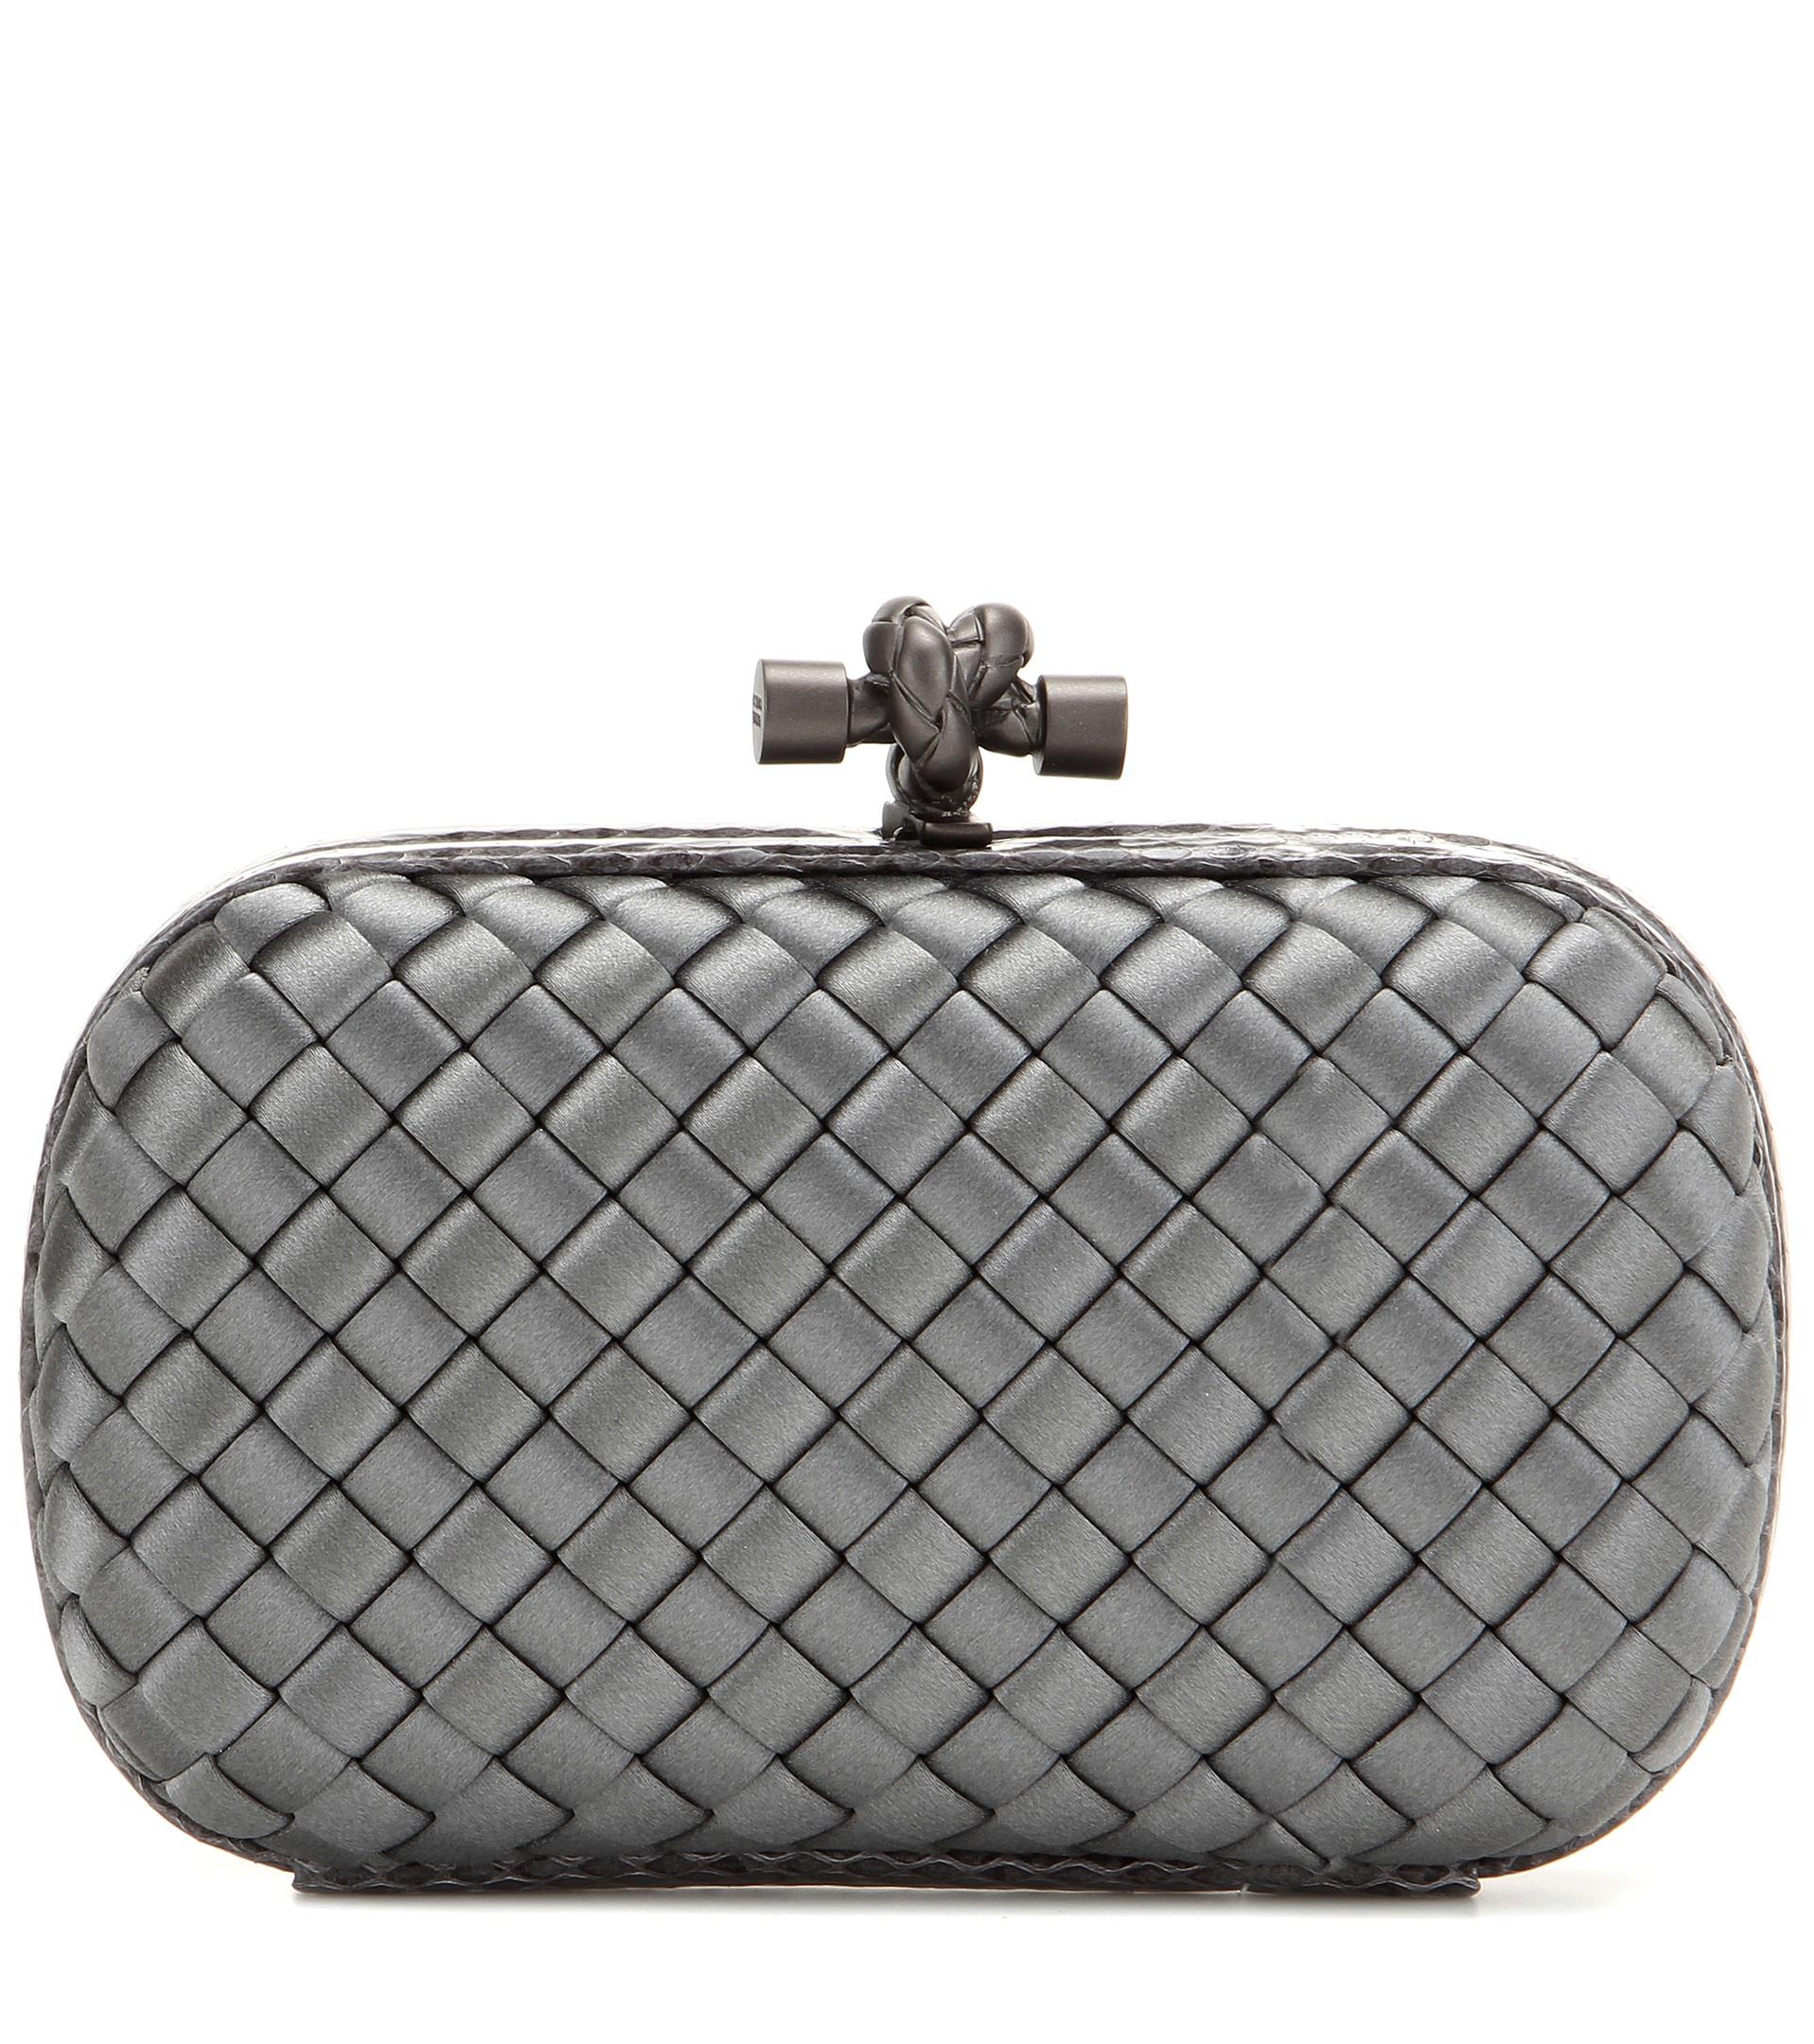 lyst bottega veneta knot satin and snakeskin clutch in gray. Black Bedroom Furniture Sets. Home Design Ideas